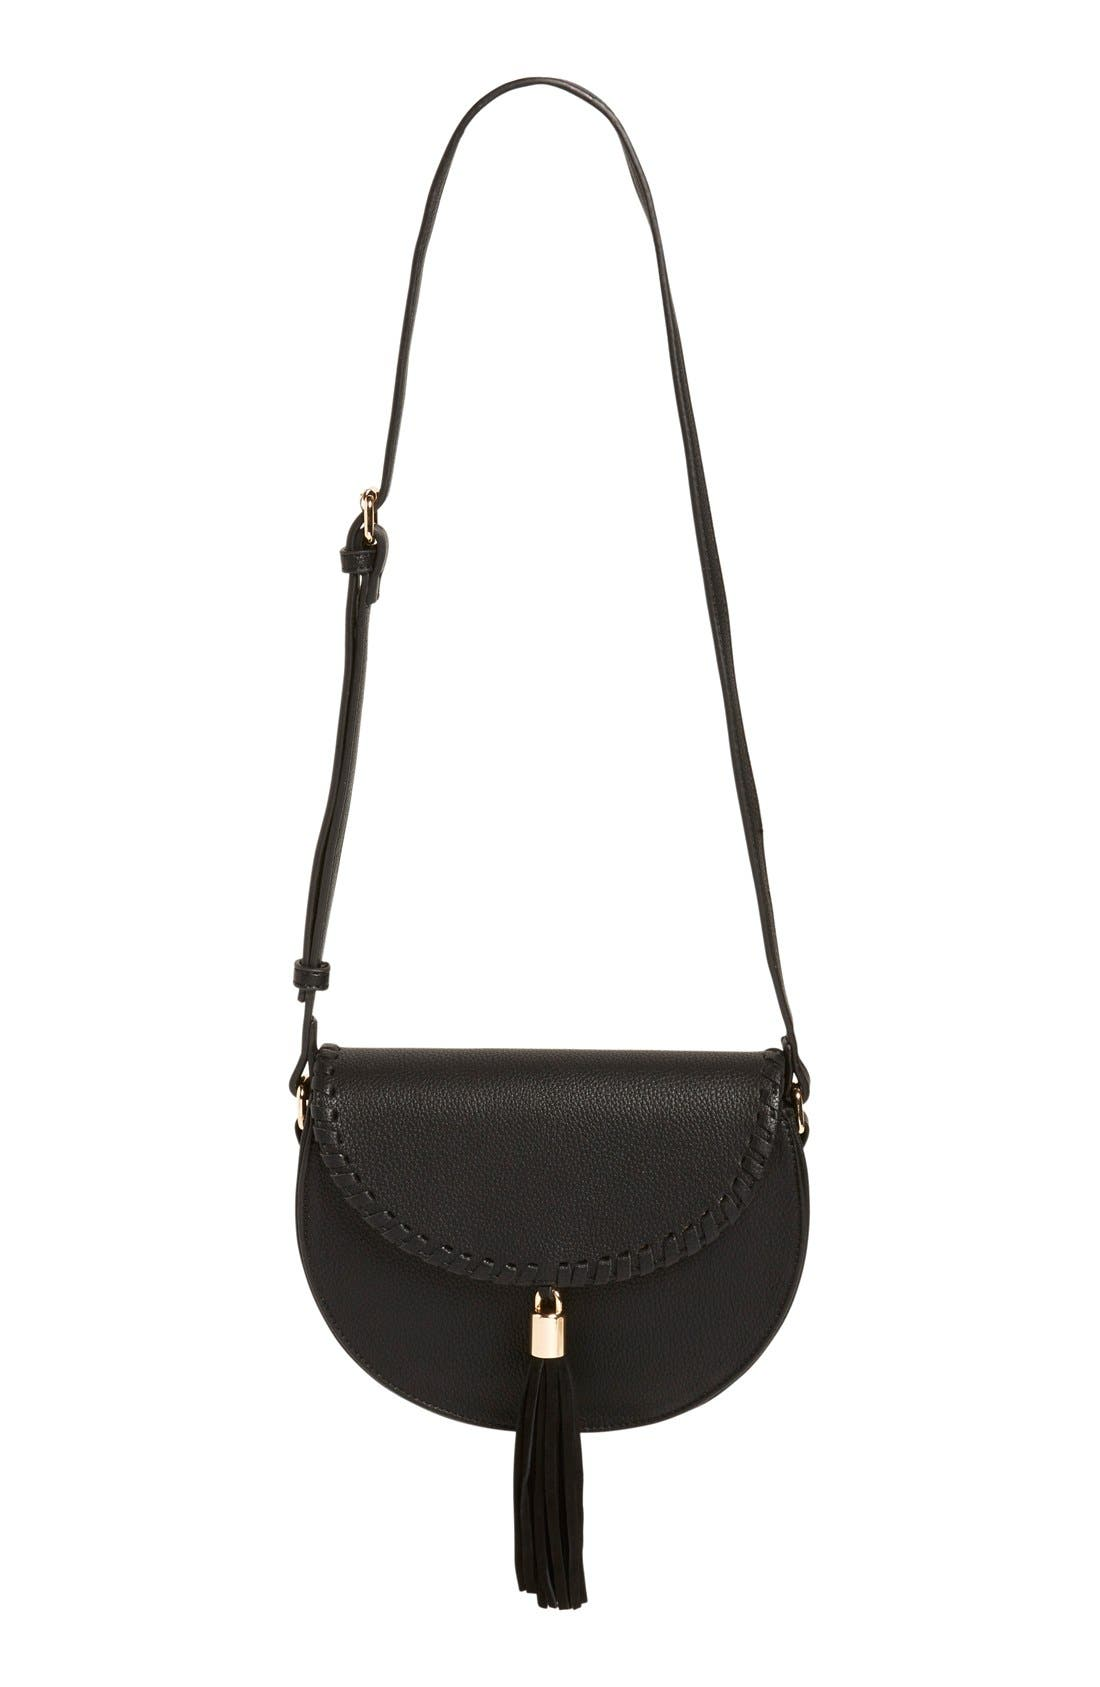 STREET LEVEL Tassel Flap Crossbody Bag, Main, color, 001